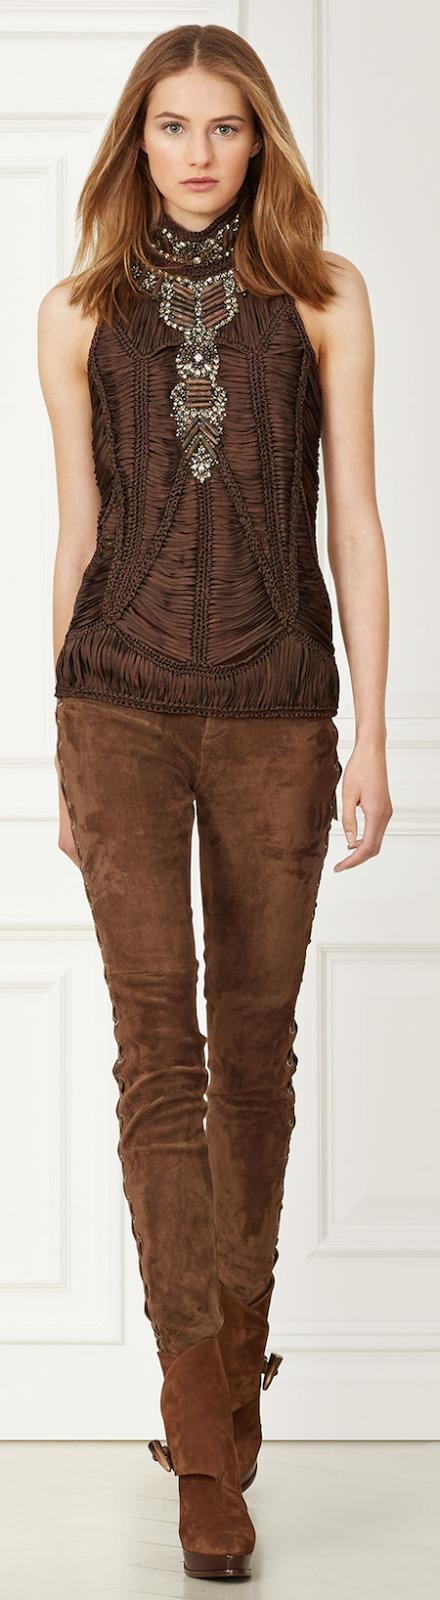 Ralph Lauren ~ Leanna Macrame Top + Saddle Brown Suede Jeans